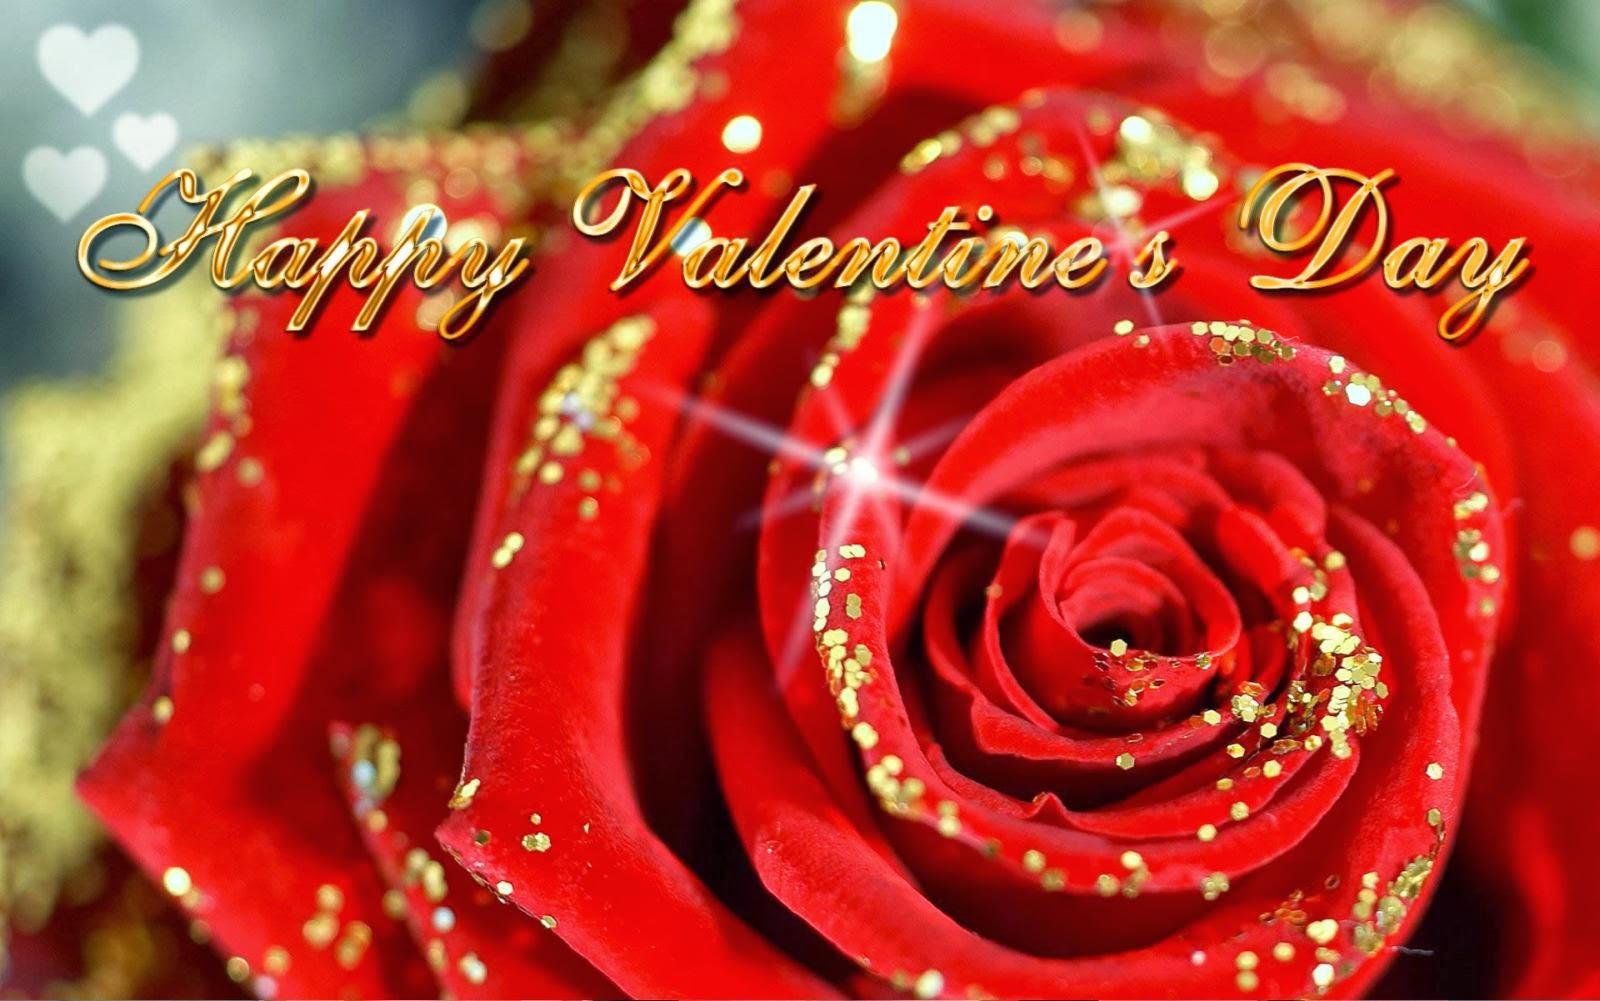 Free Wallpaper Valentine - WallpaperSafari